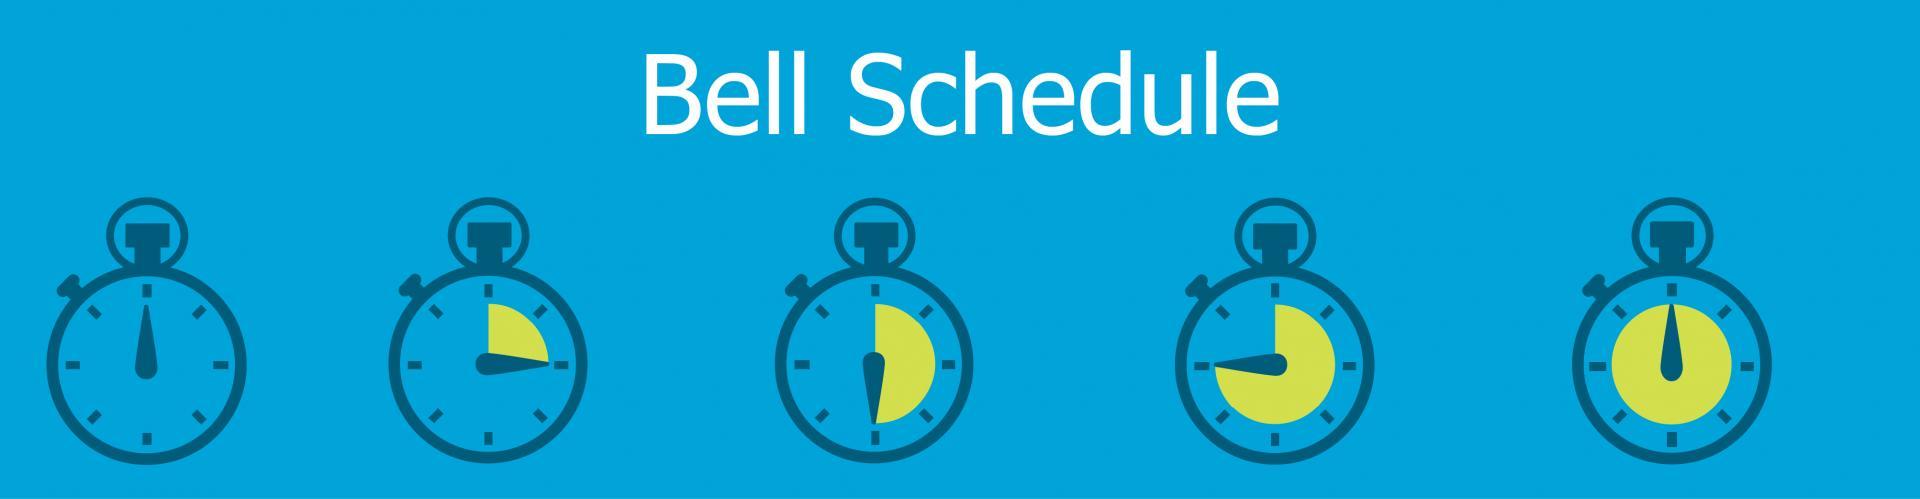 Bell Schedule Banner